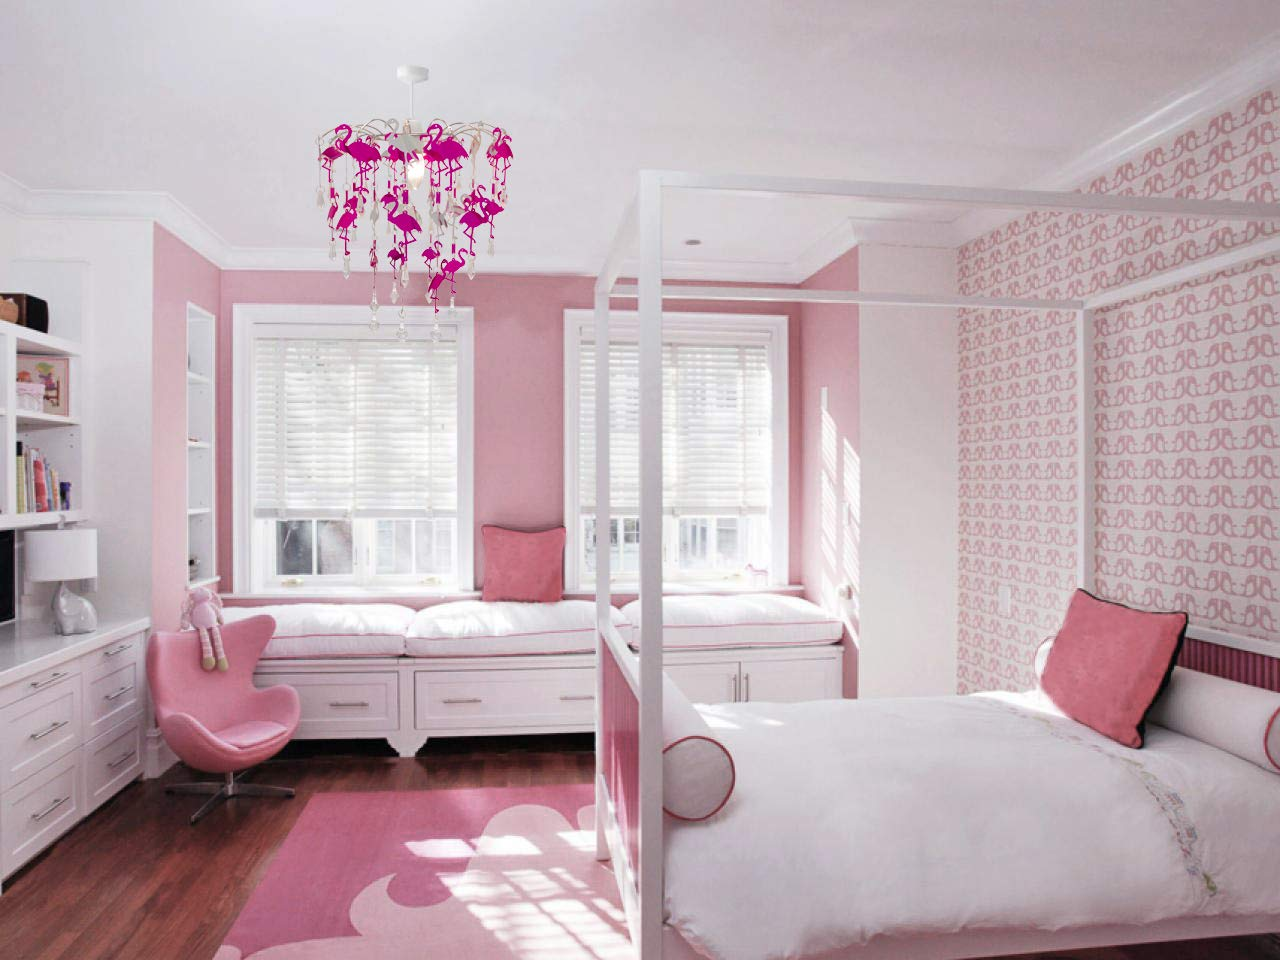 Kronleuchter Für Kinder ~ Kinder meerjungfrau flamingo feen schlafzimmer kronleuchter